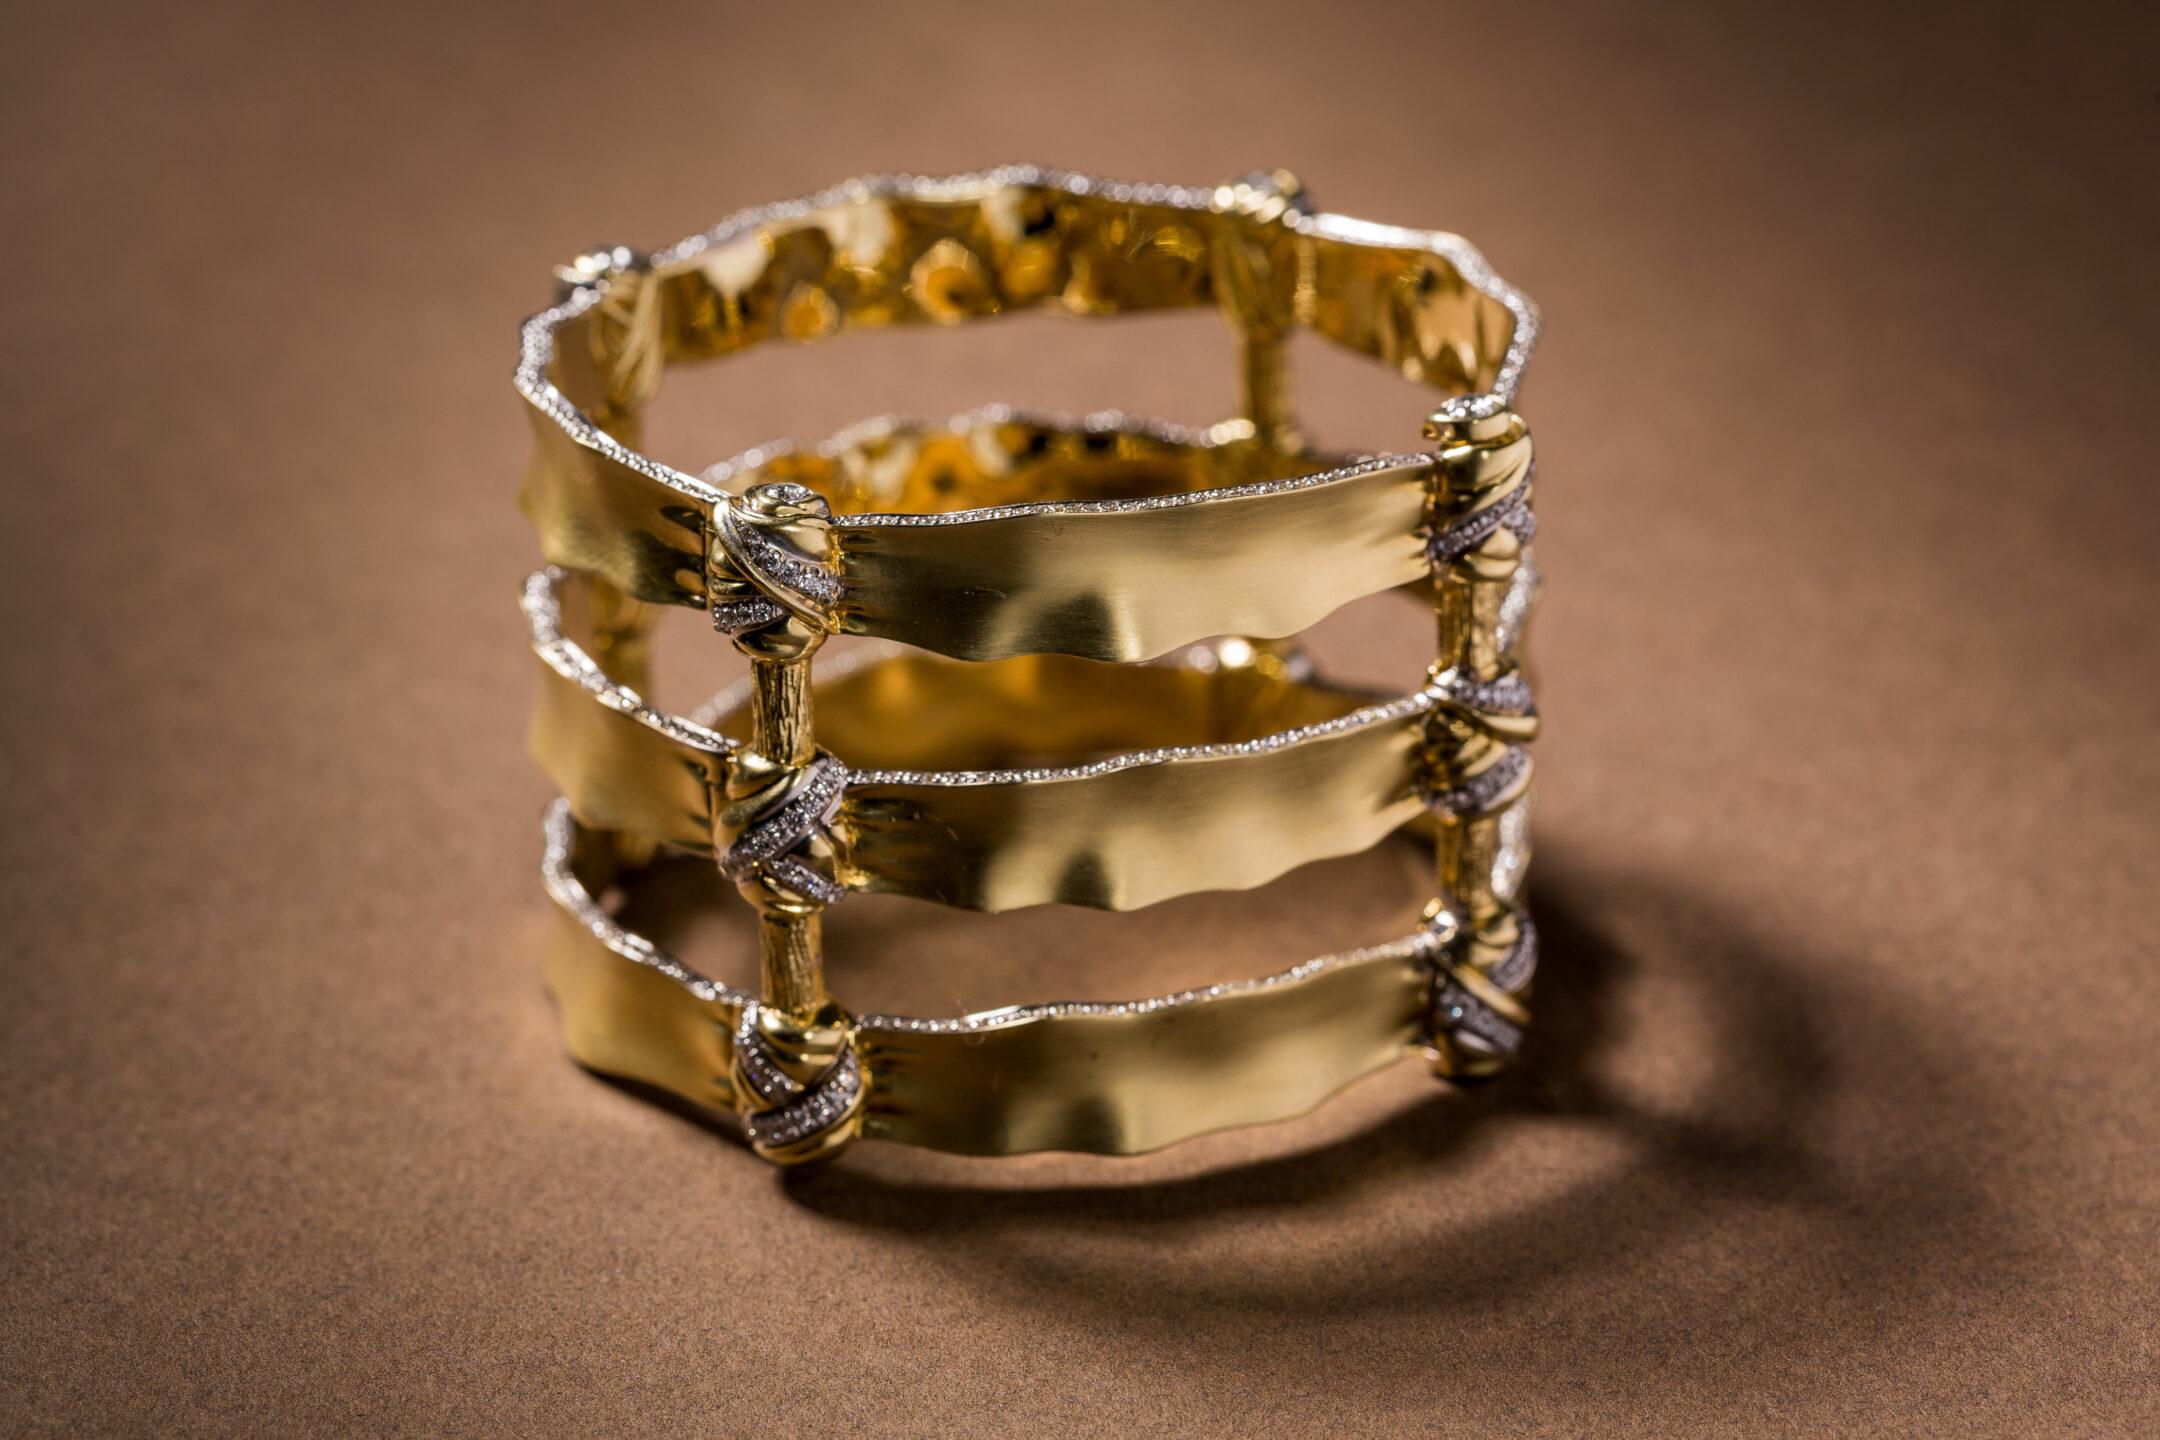 mish_jewelry_product_Bond-Bow-Cuff-4